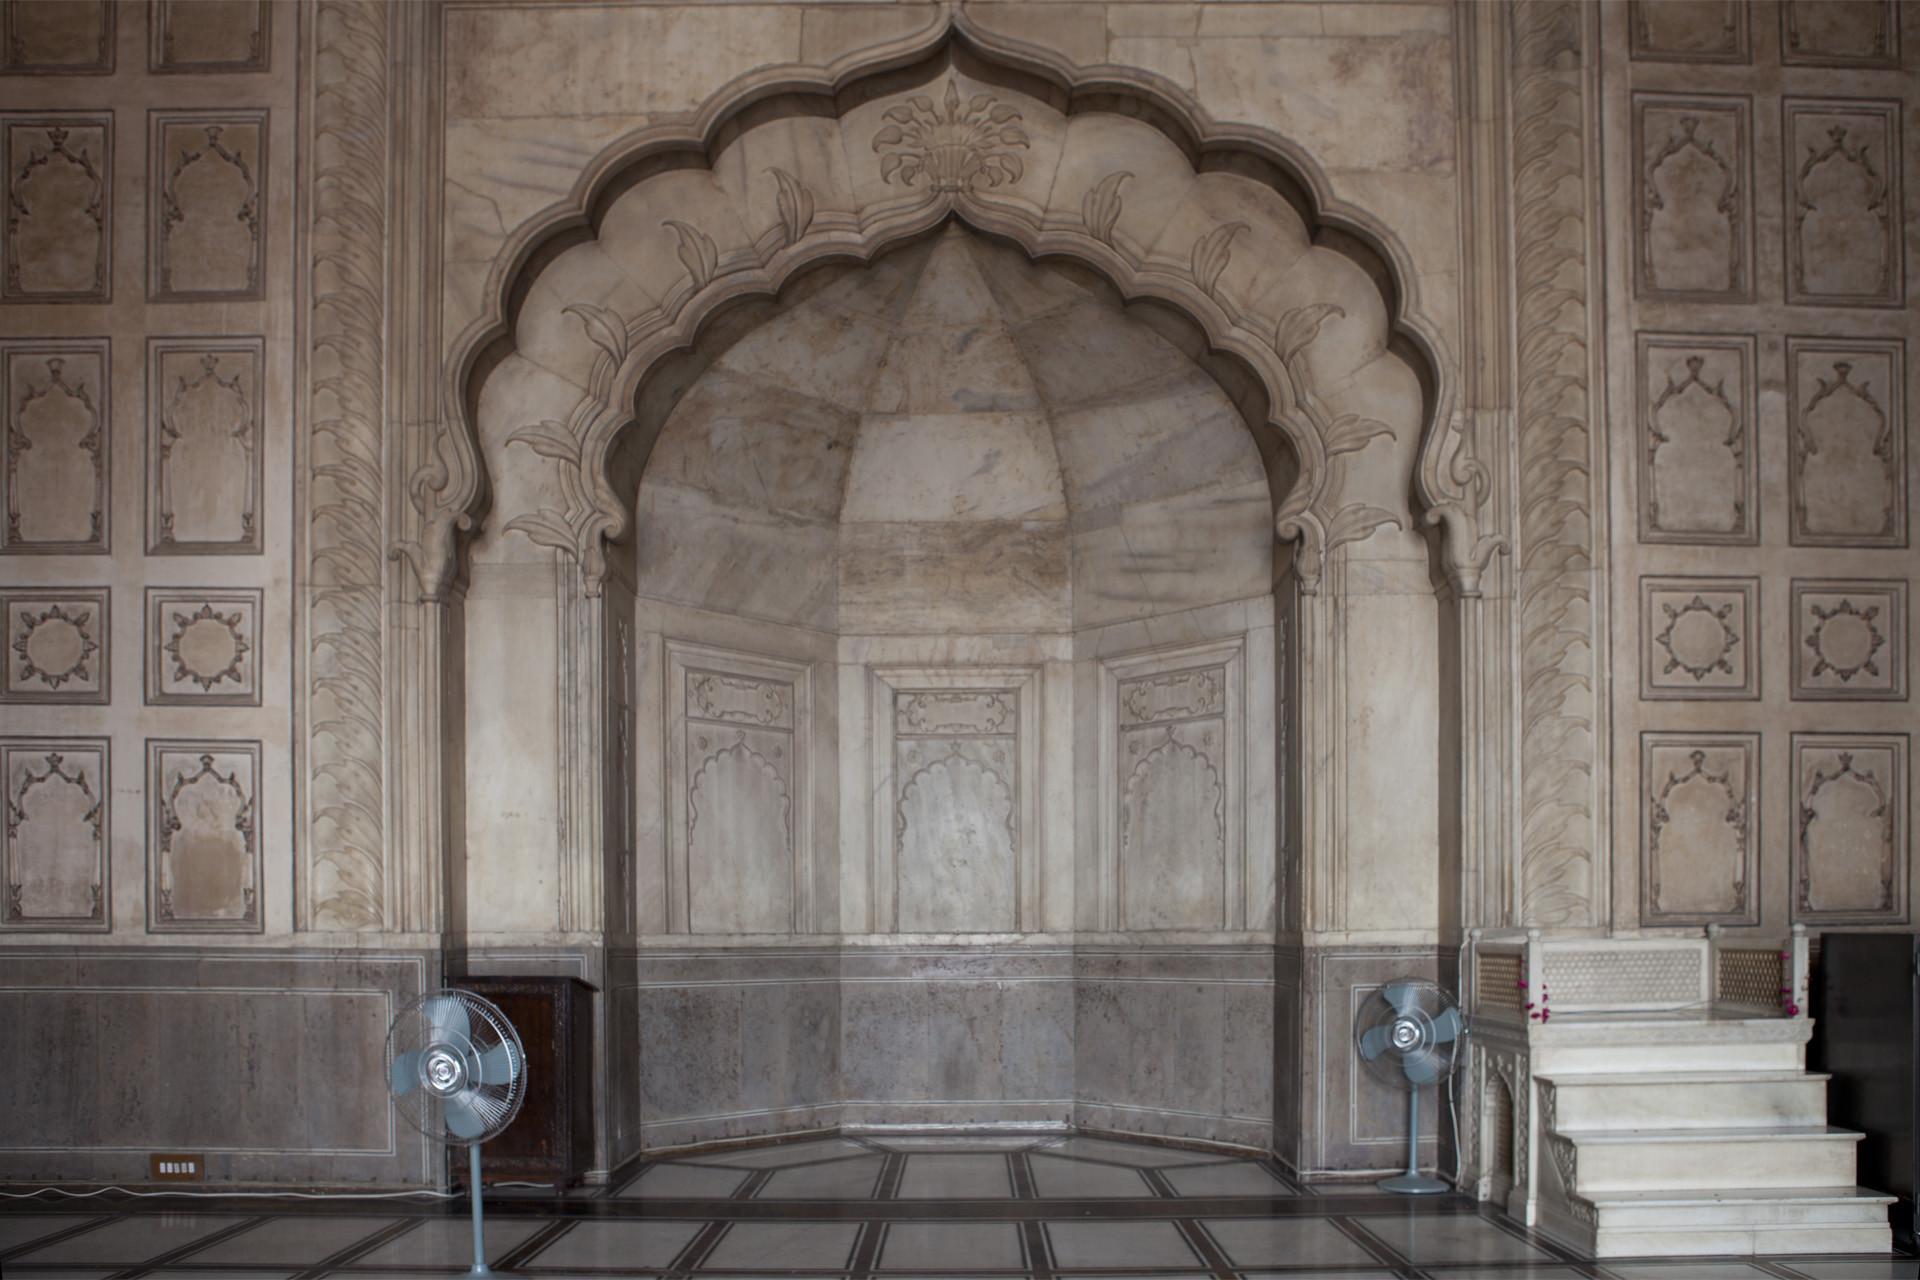 Badshahi Mosque Alcove